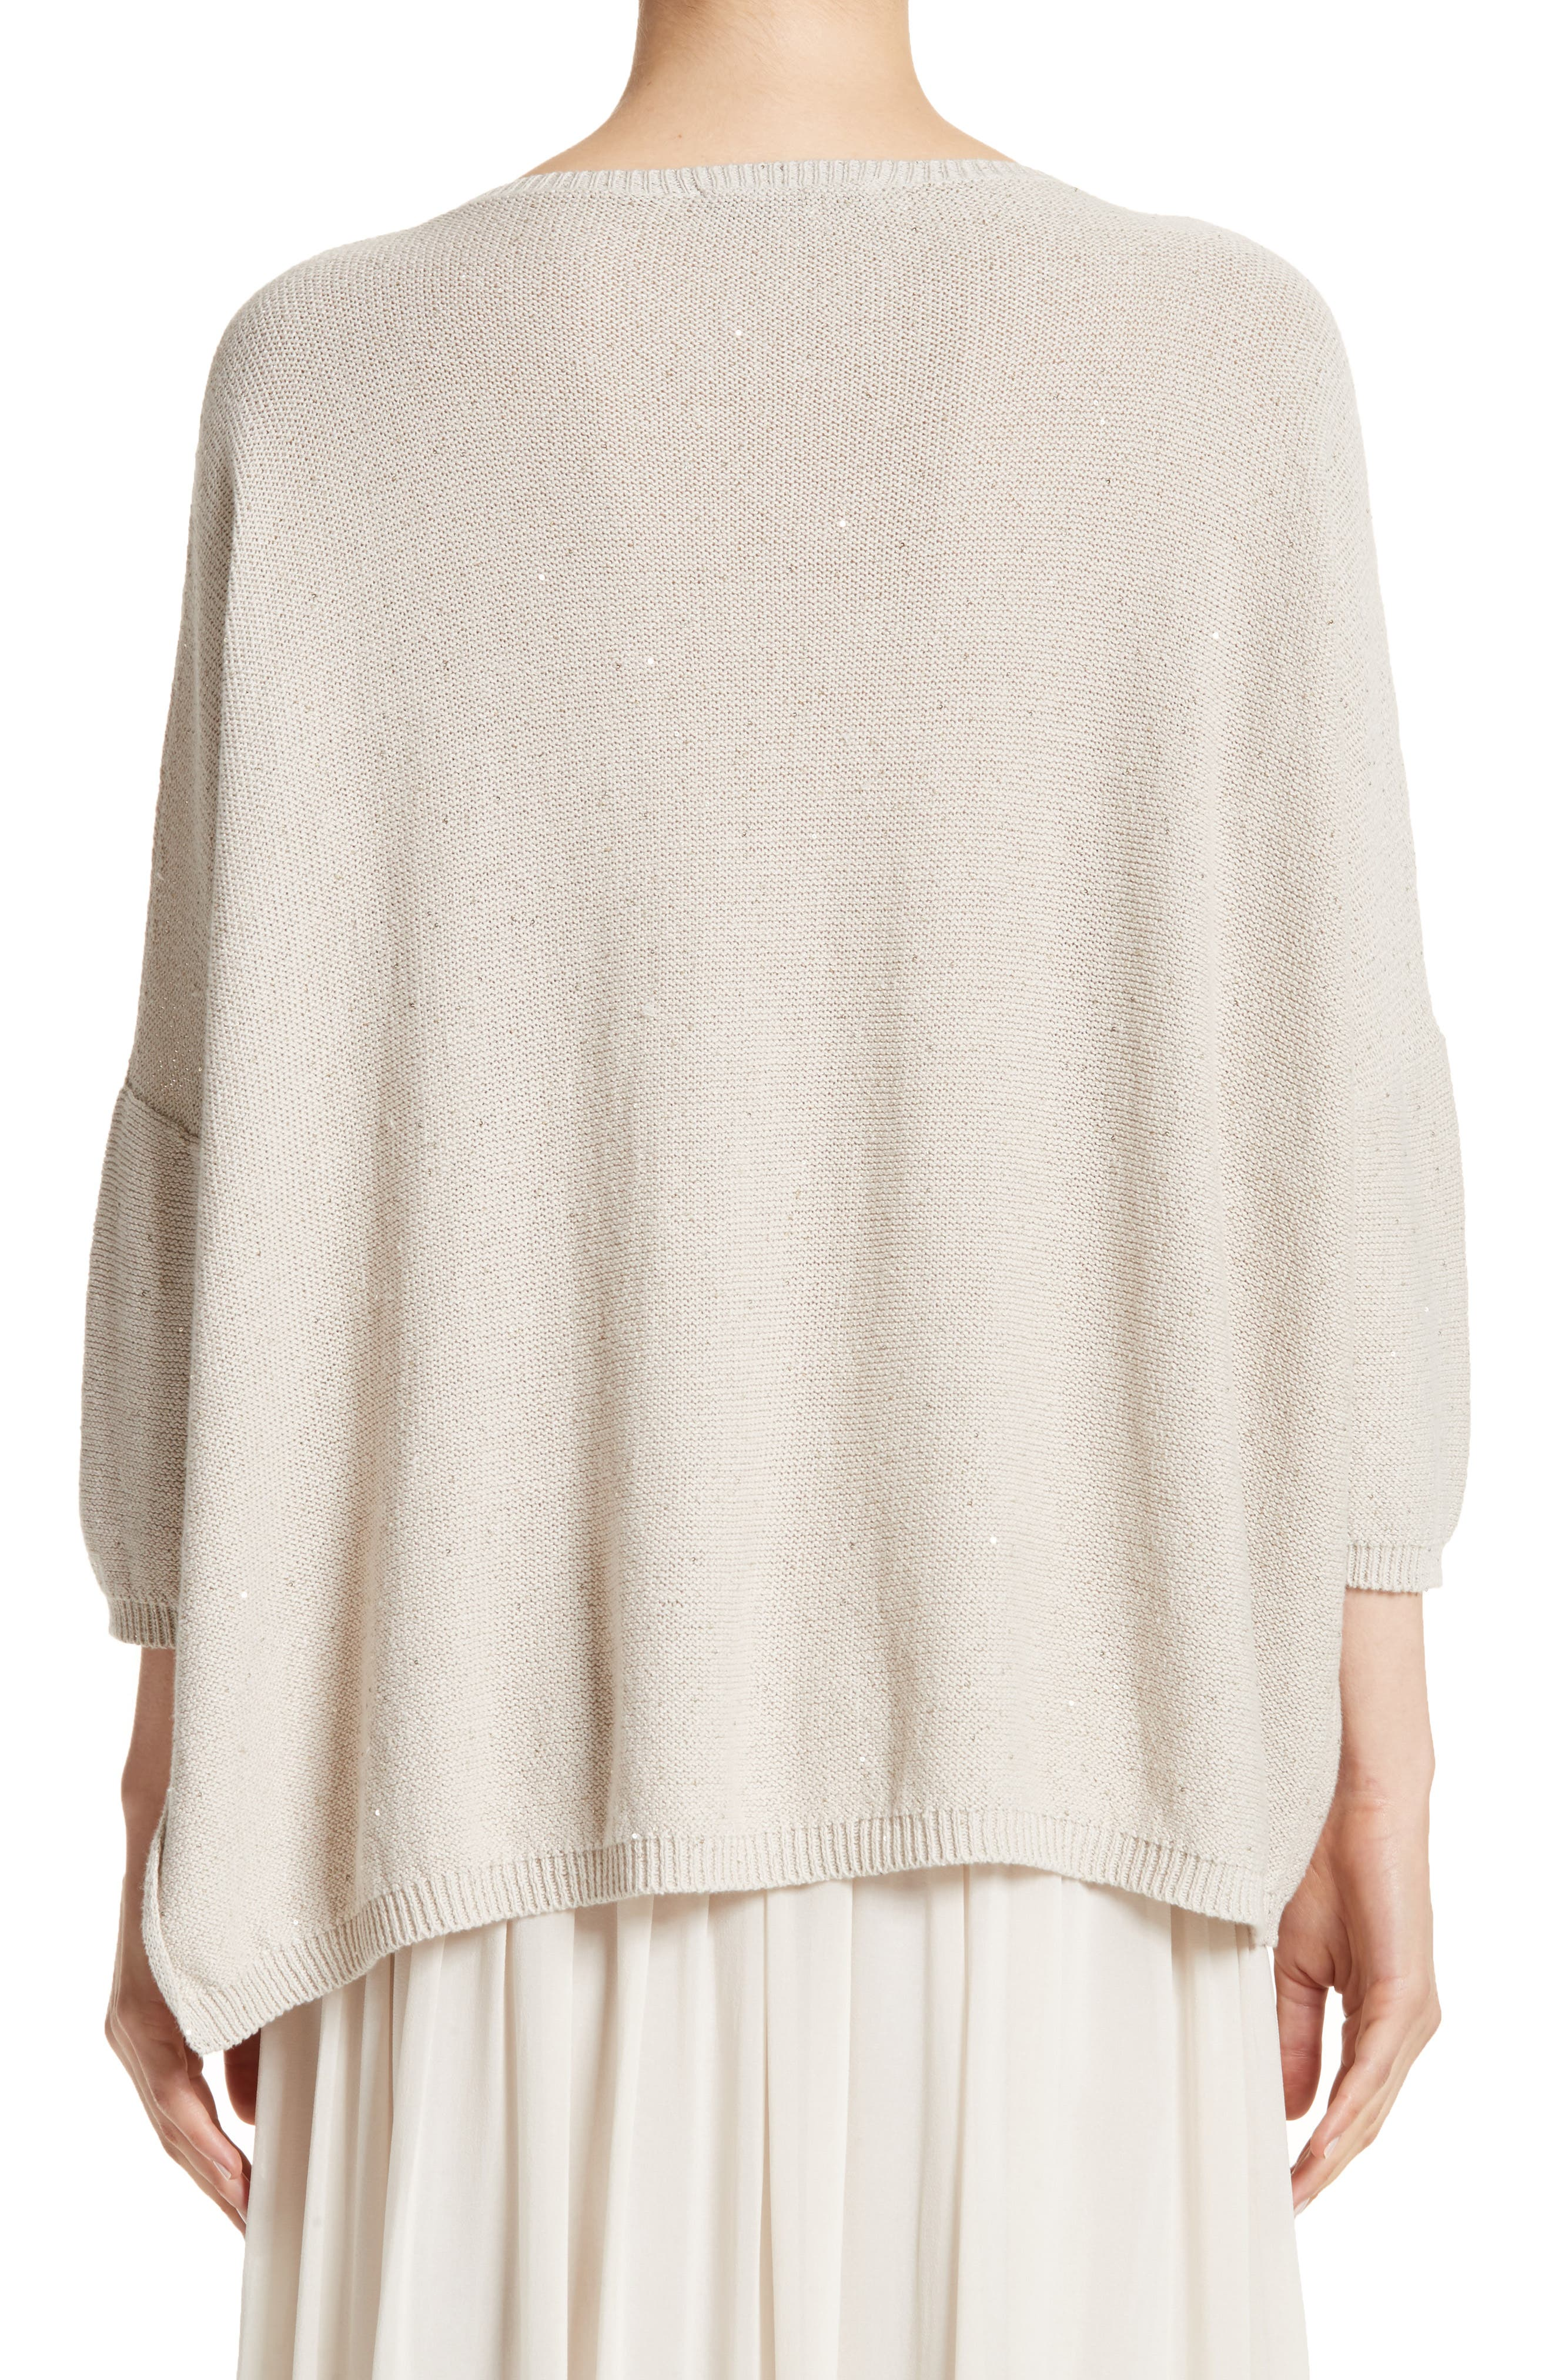 Alternate Image 3  - Fabiana Filippi Sequin Knit Dolman Sweater